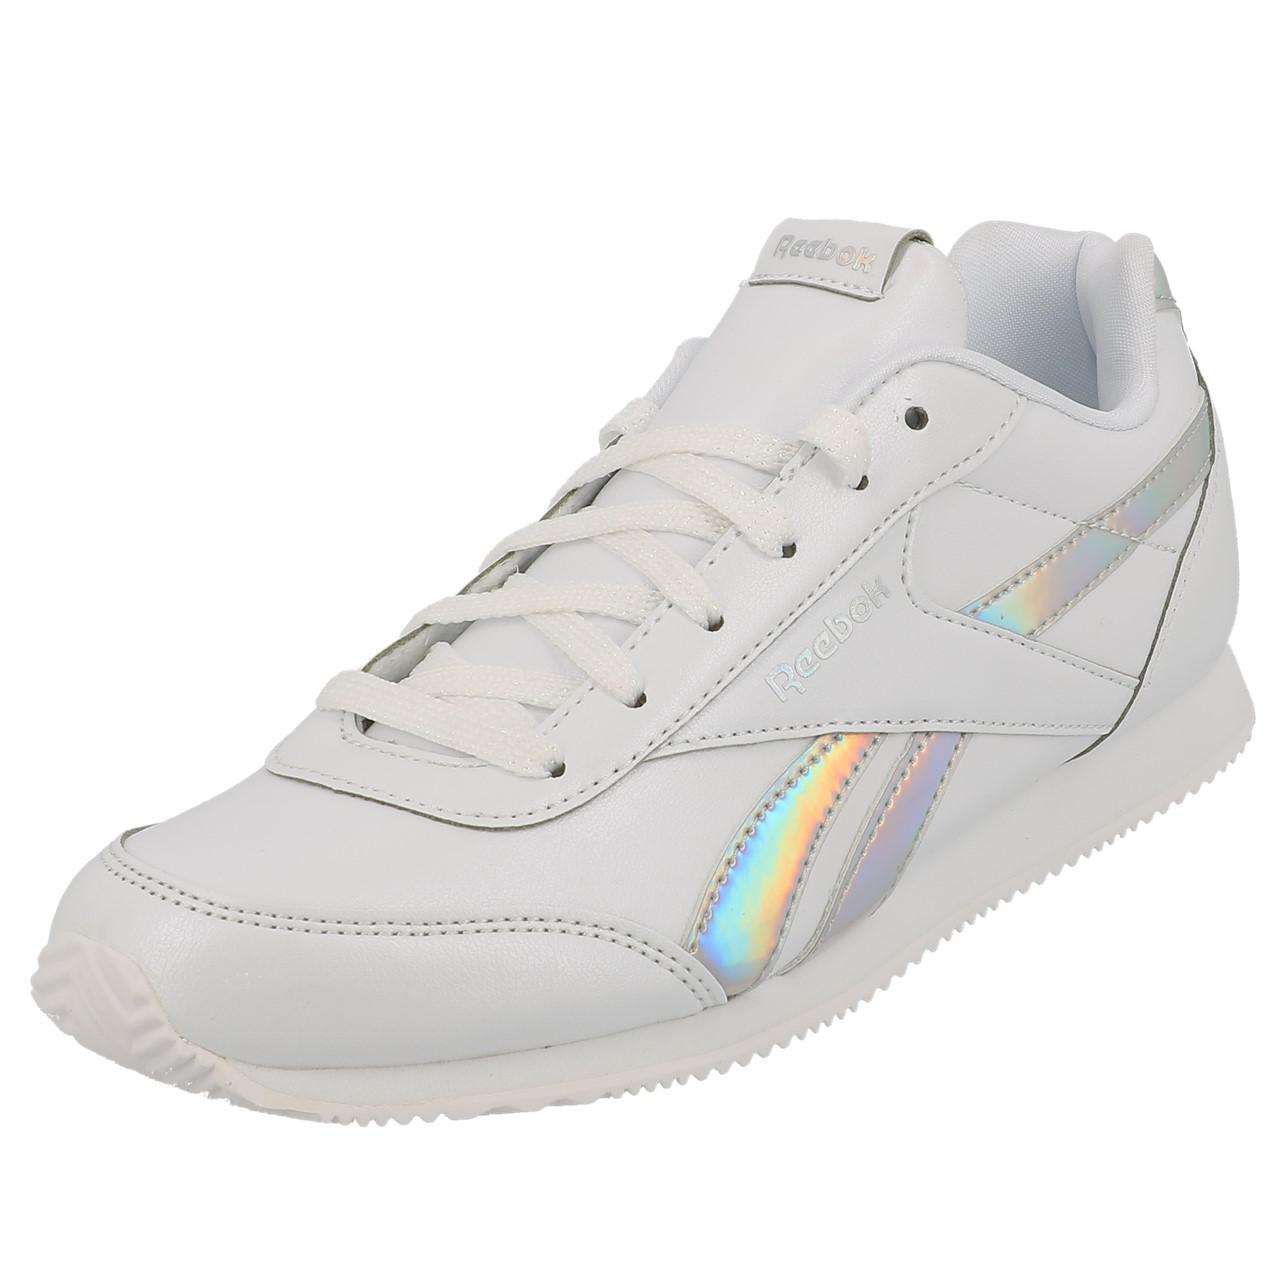 Schuhe-Niedrig-Leder-oder-Faux-Reebok-Royal-Cljog-White-Maedchen-Weiss-18852-Neu